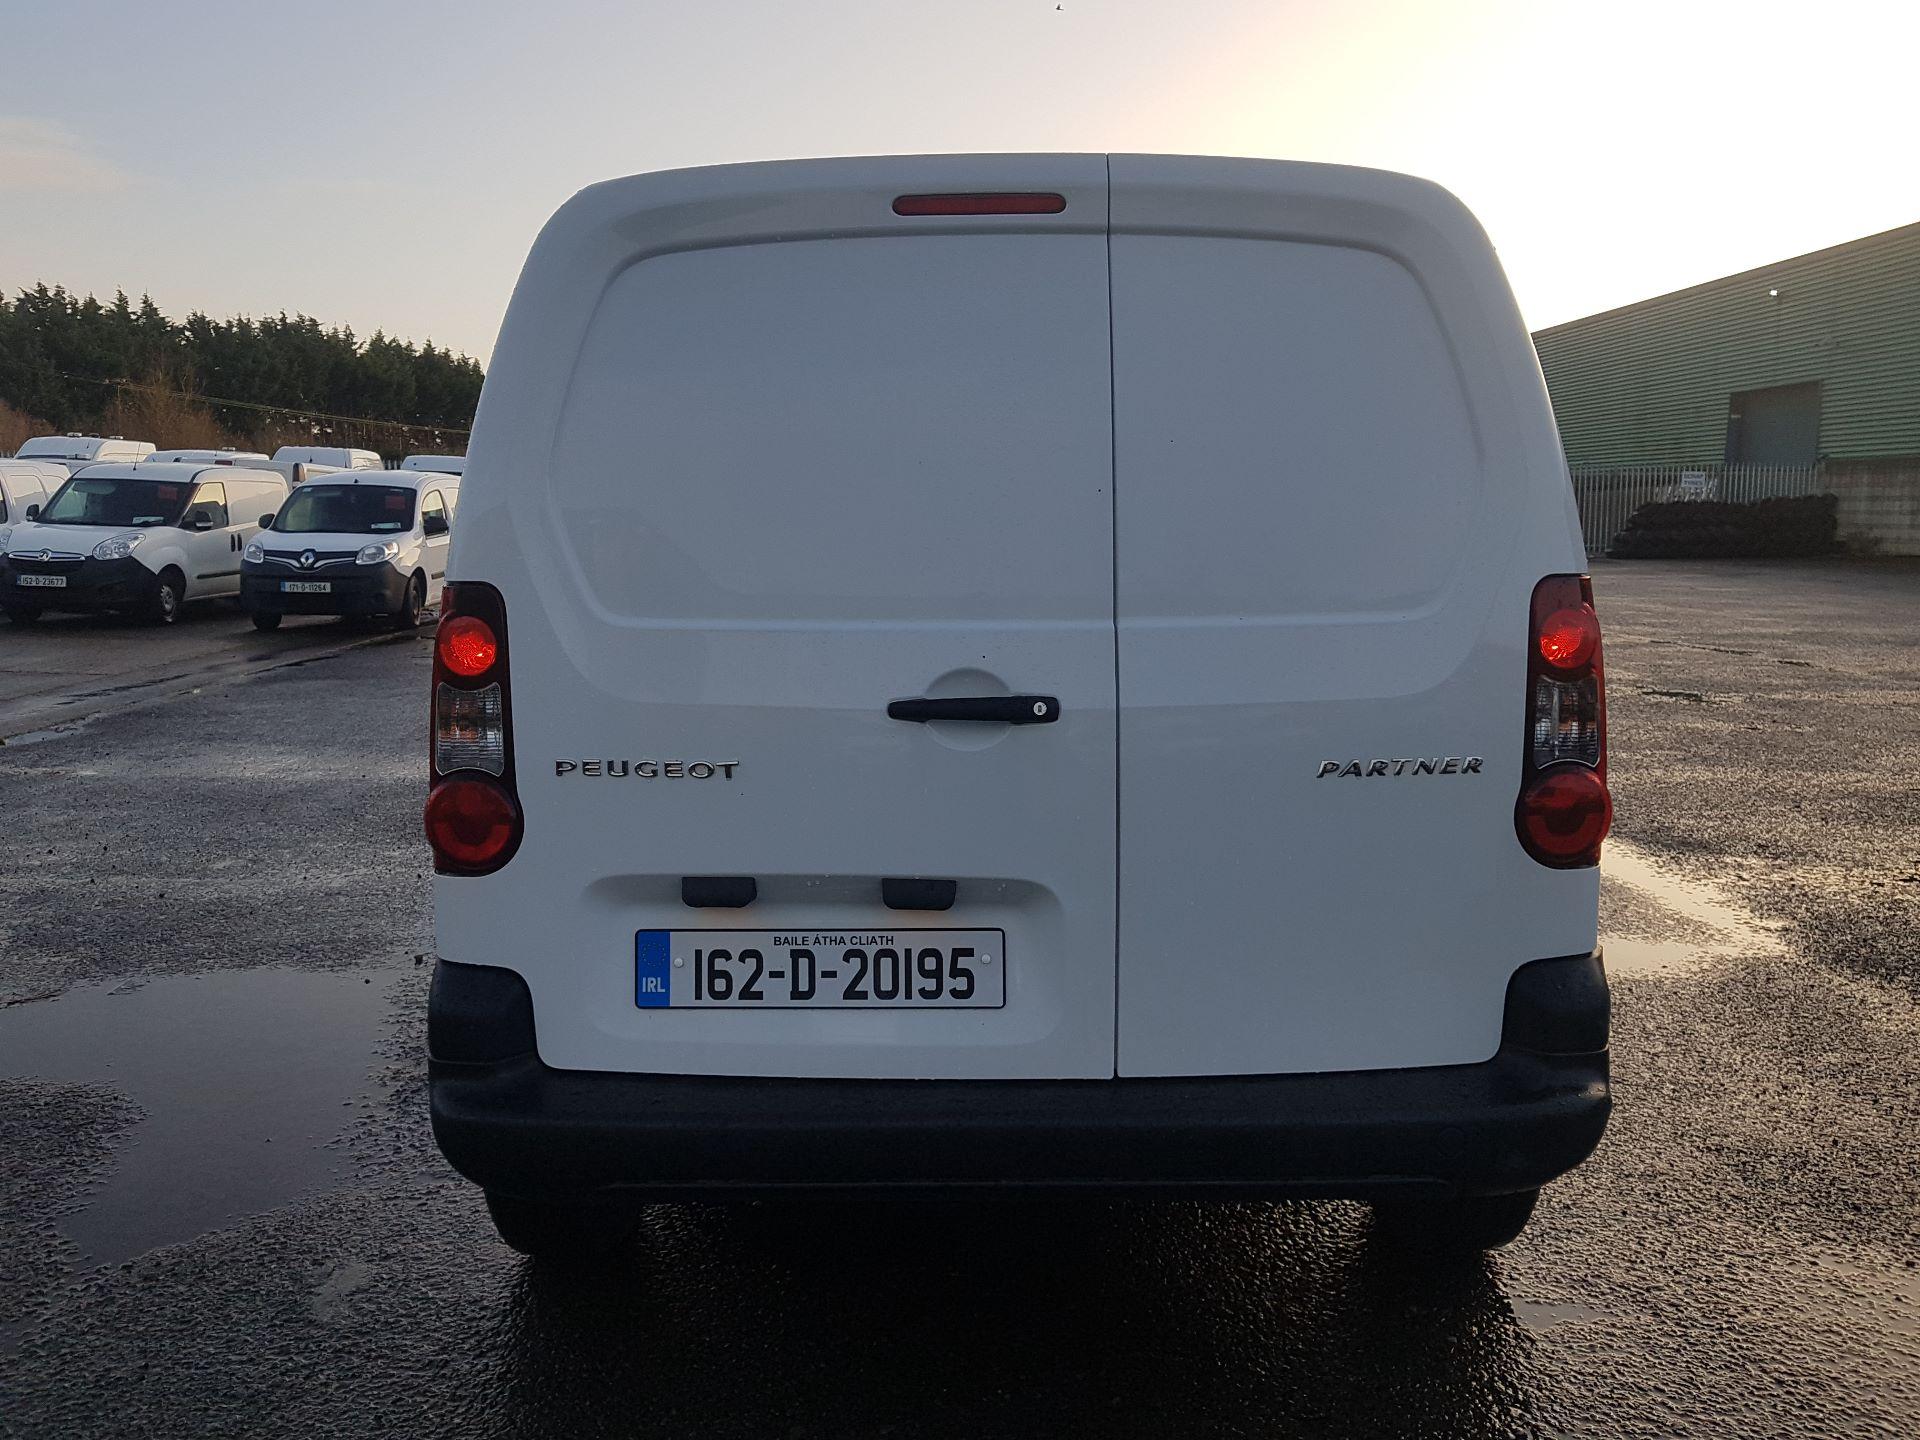 2016 Peugeot Partner Access 1.6 HDI 92 3DR (162D20195) Image 5